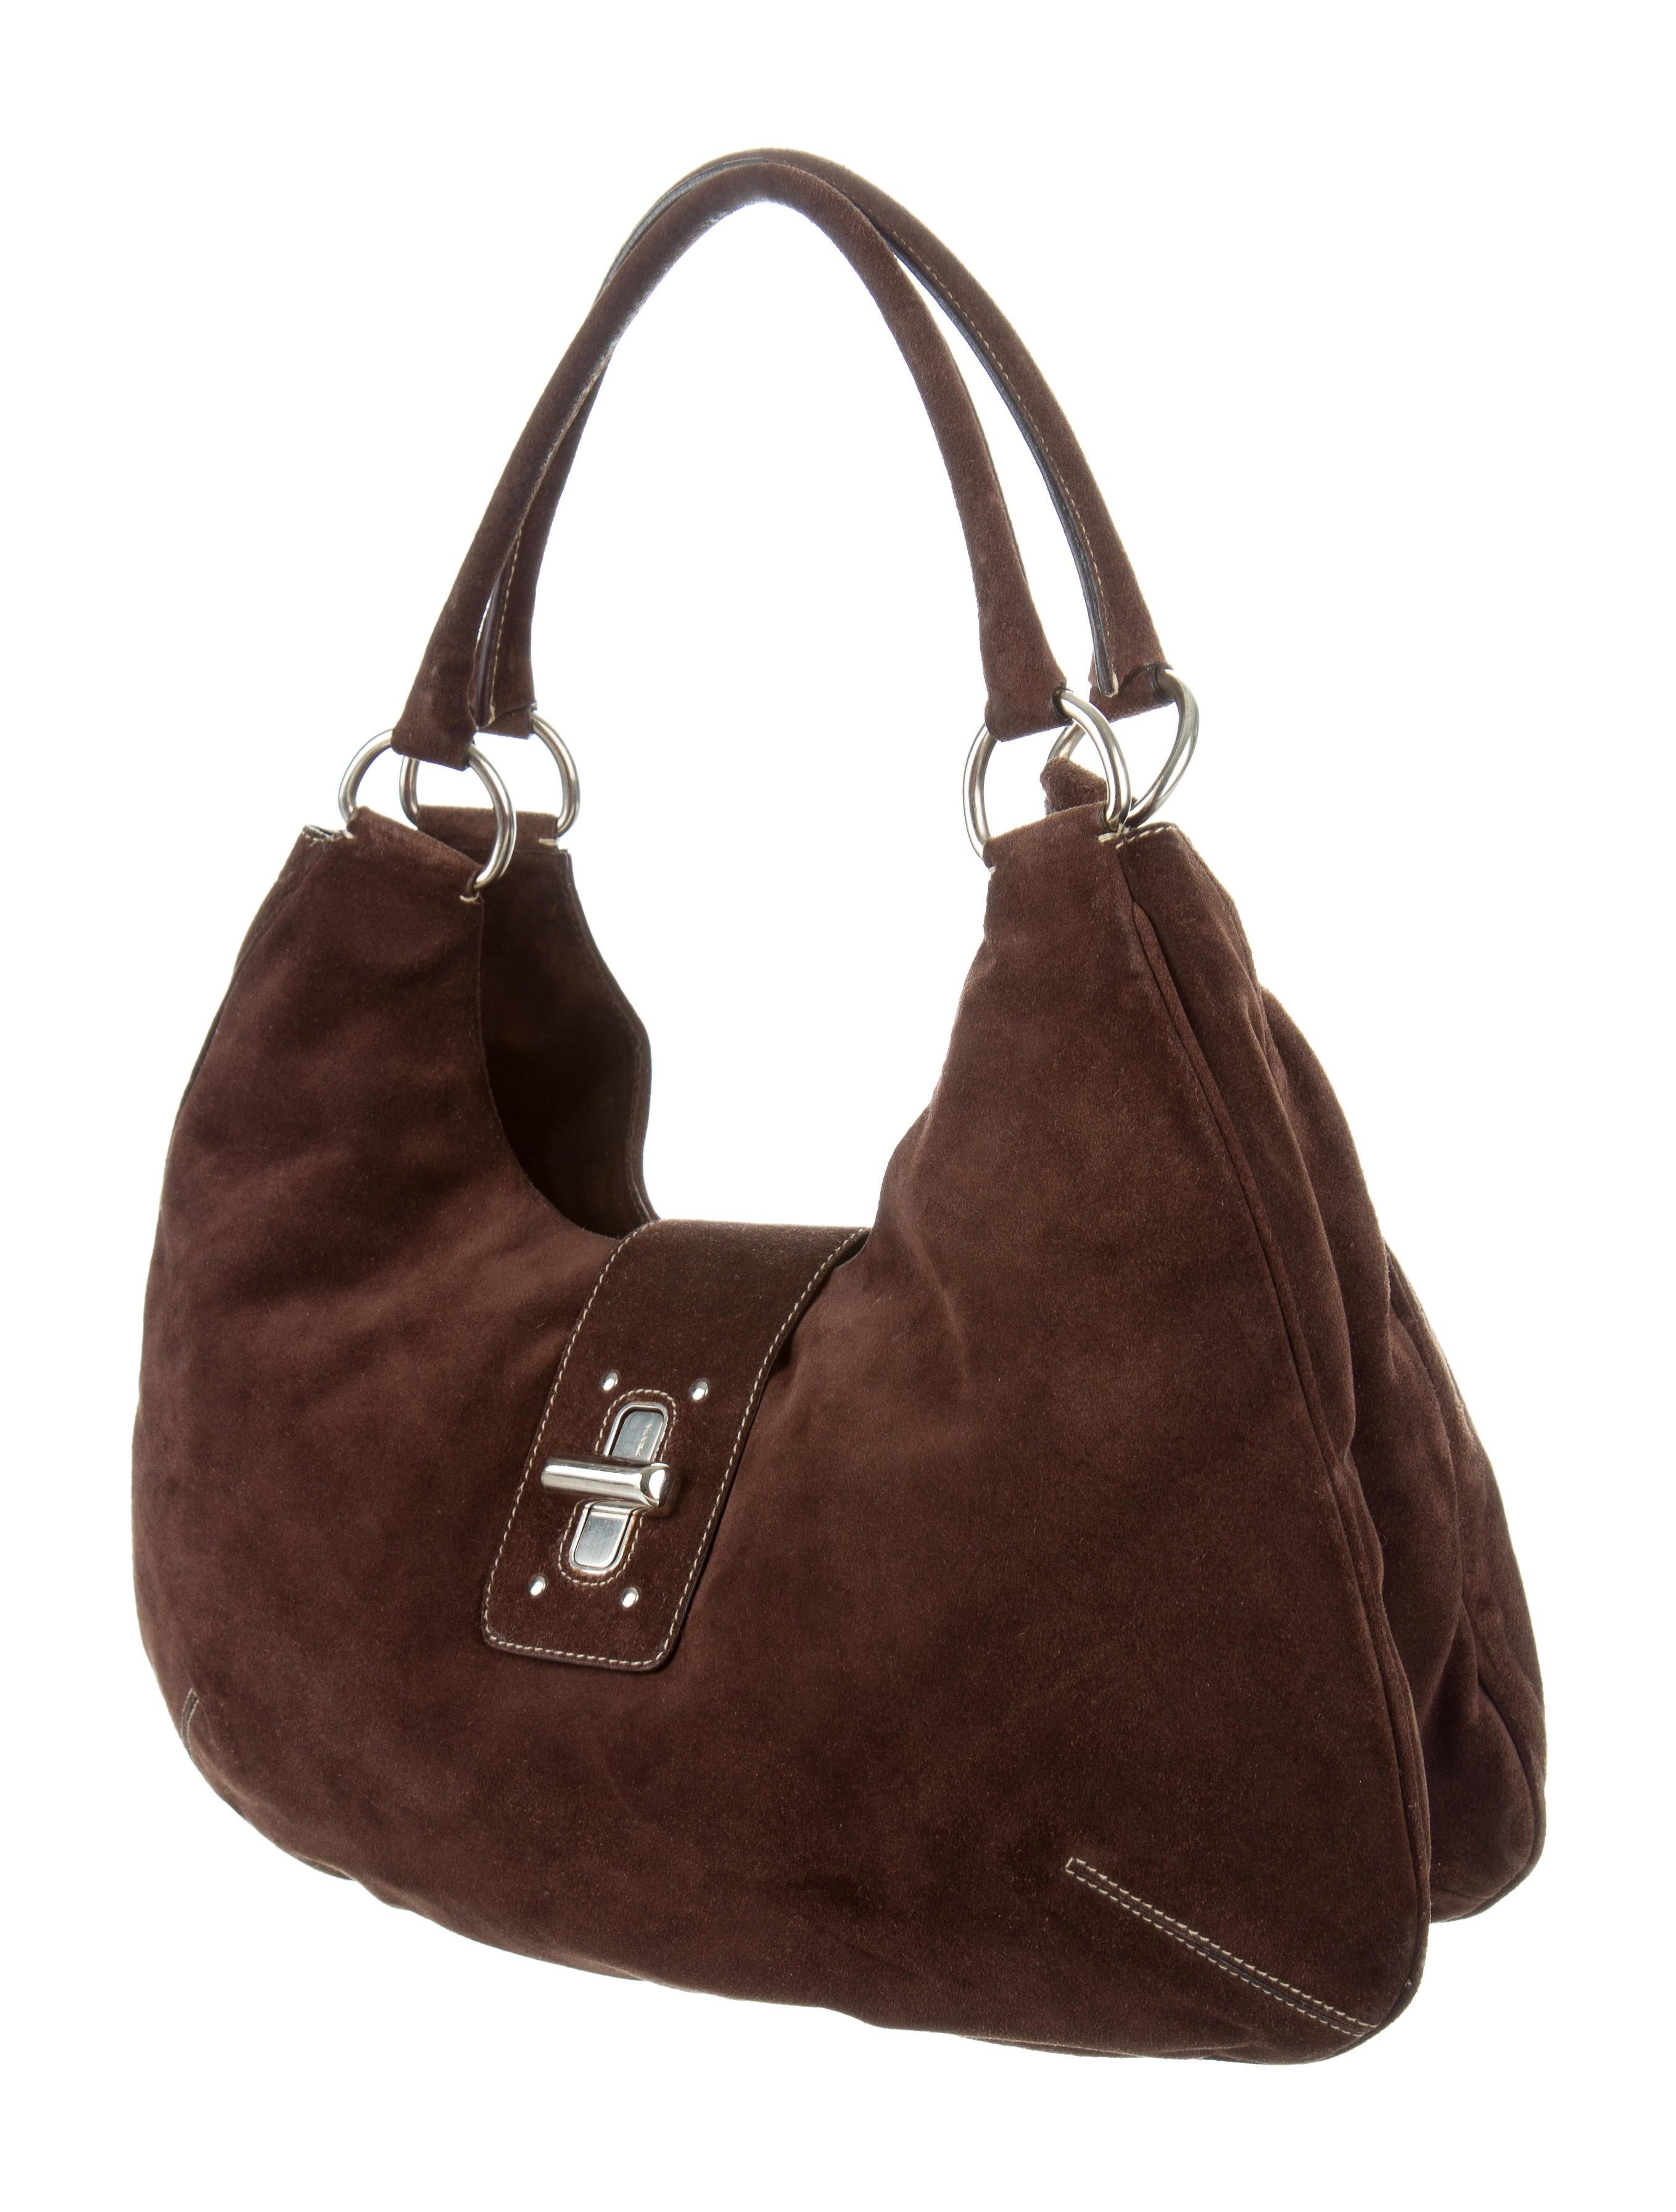 Prada Suede Shoulder Bag Handbags Pra139718 The Realreal